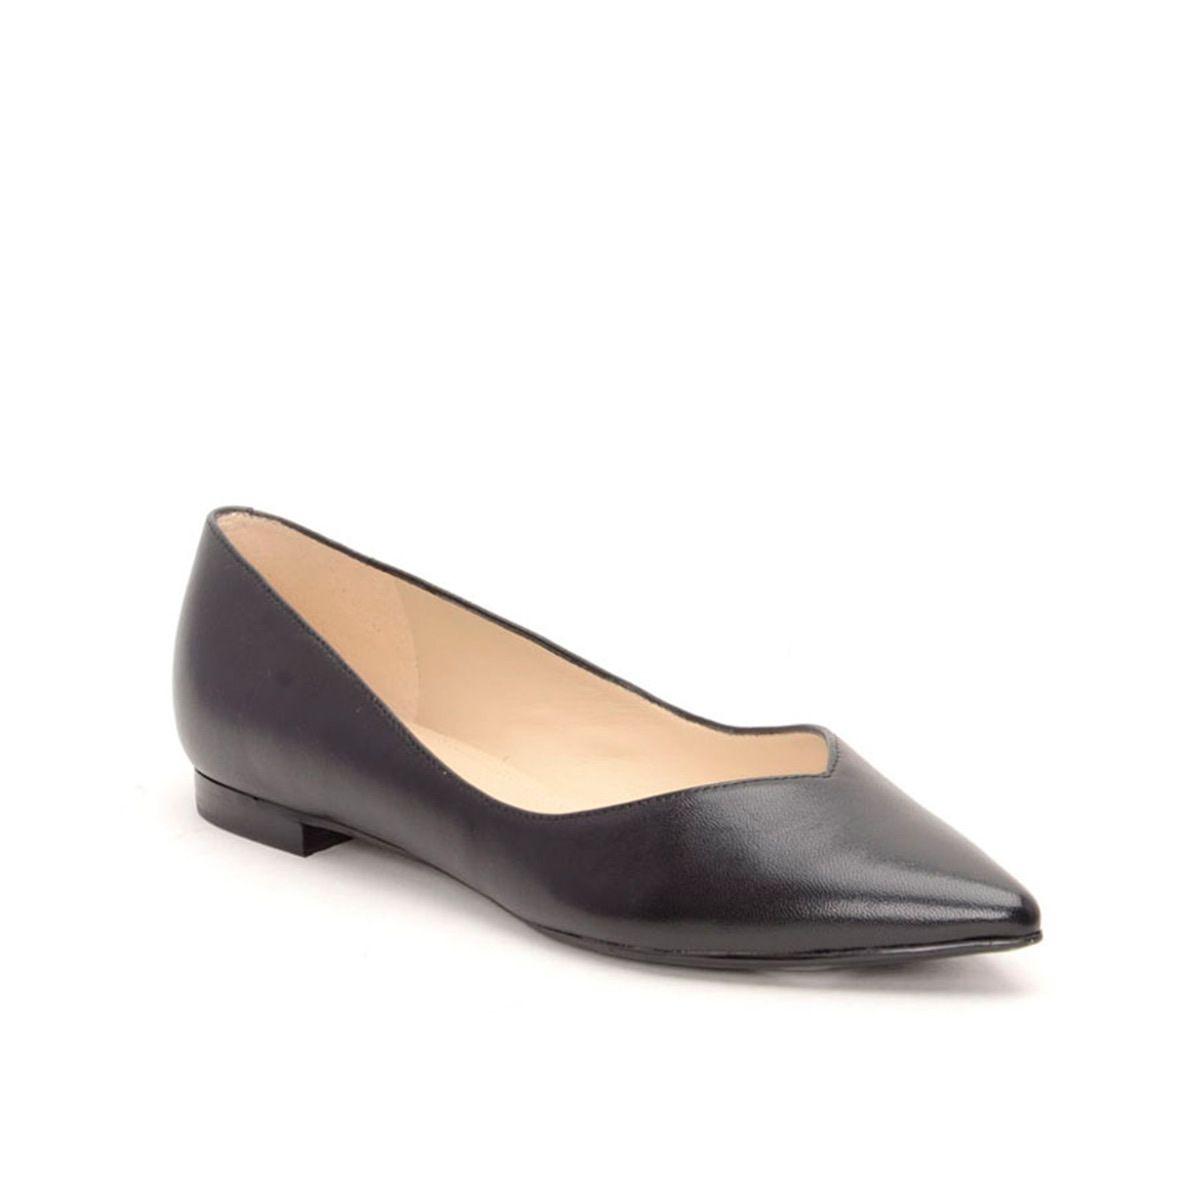 59de550ae5e9 Marc Fisher Shoes - Macy s